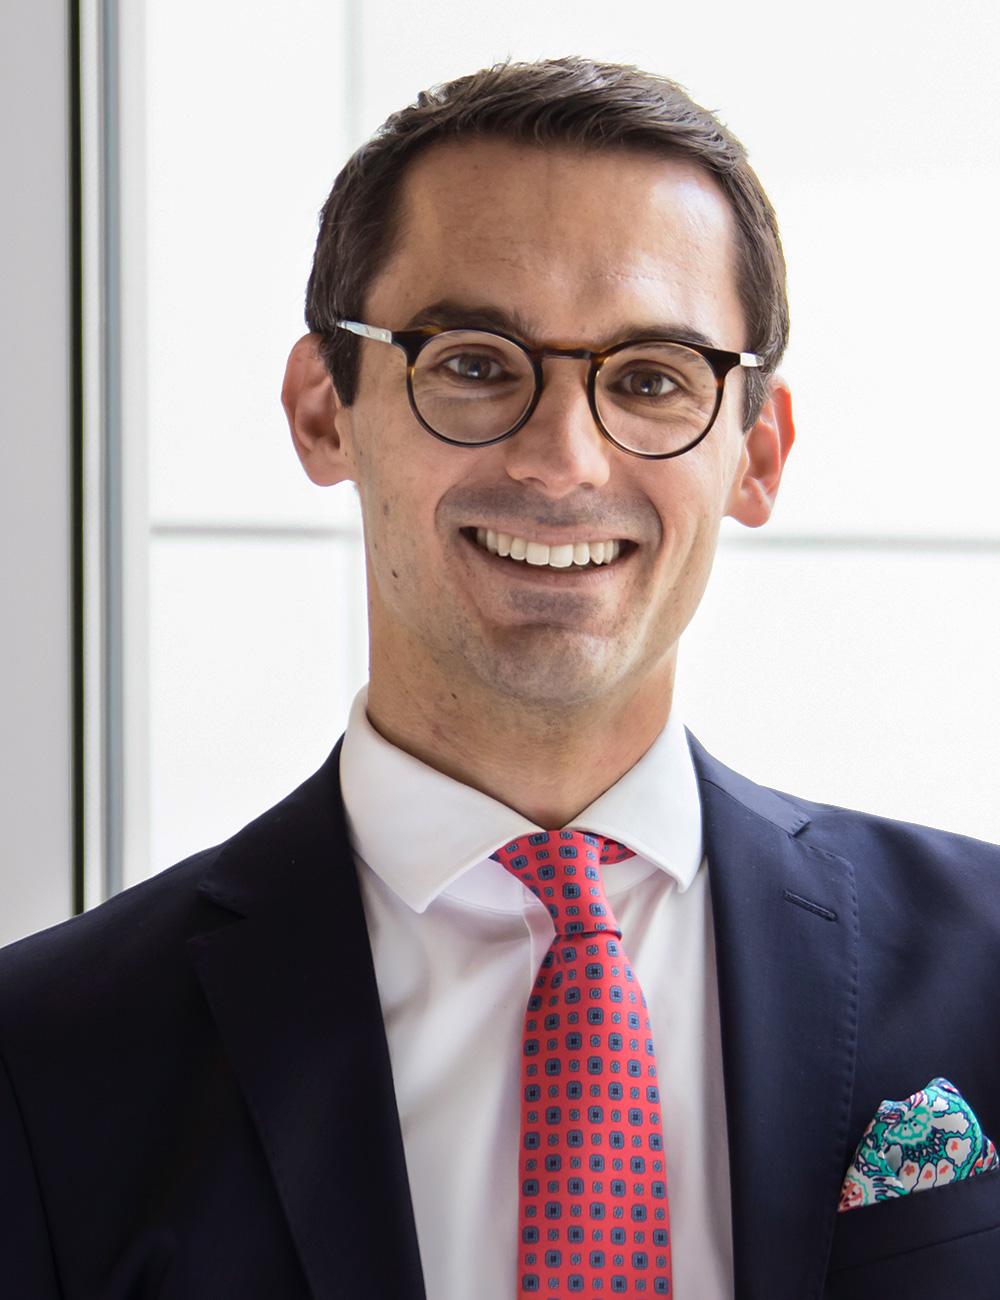 Steuerberater Michael Kühner